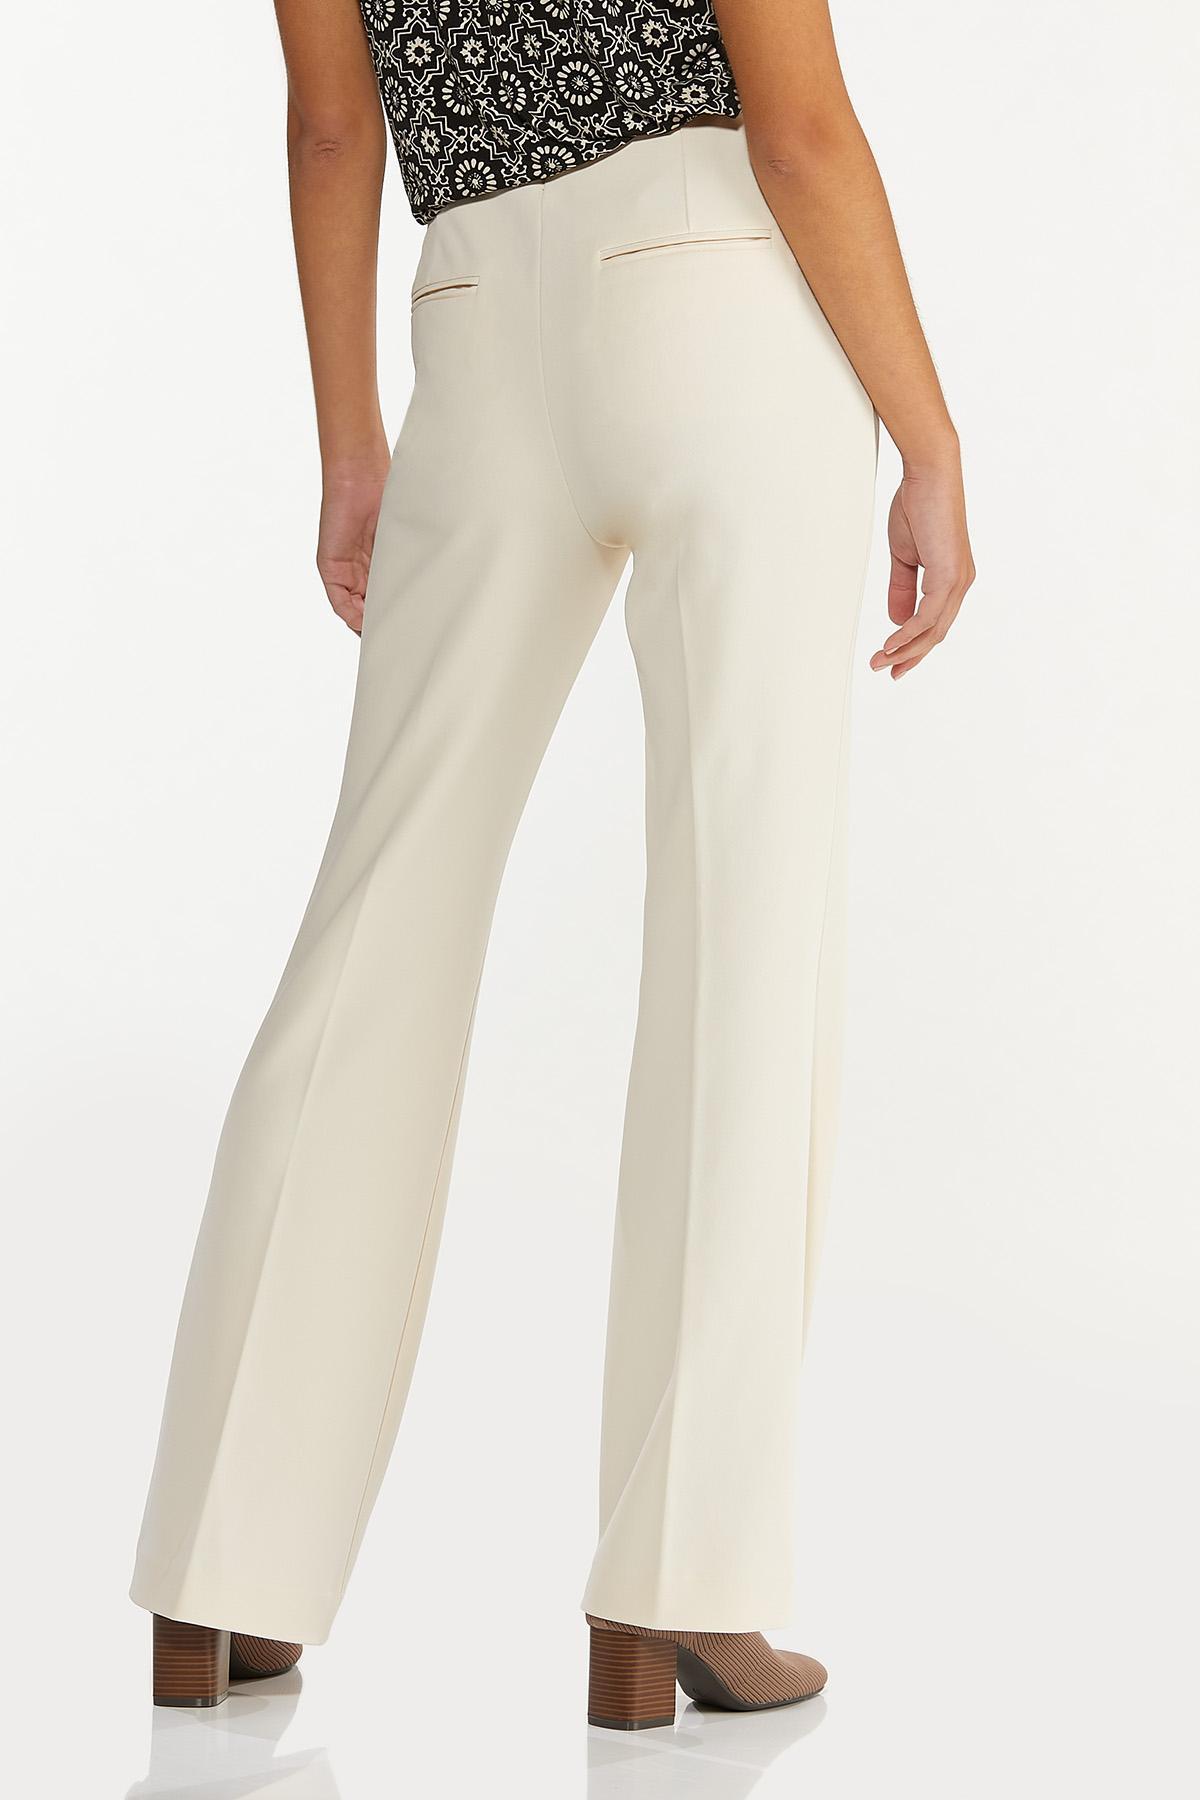 Petite Sailor Button Pull-On Pants (Item #44651579)